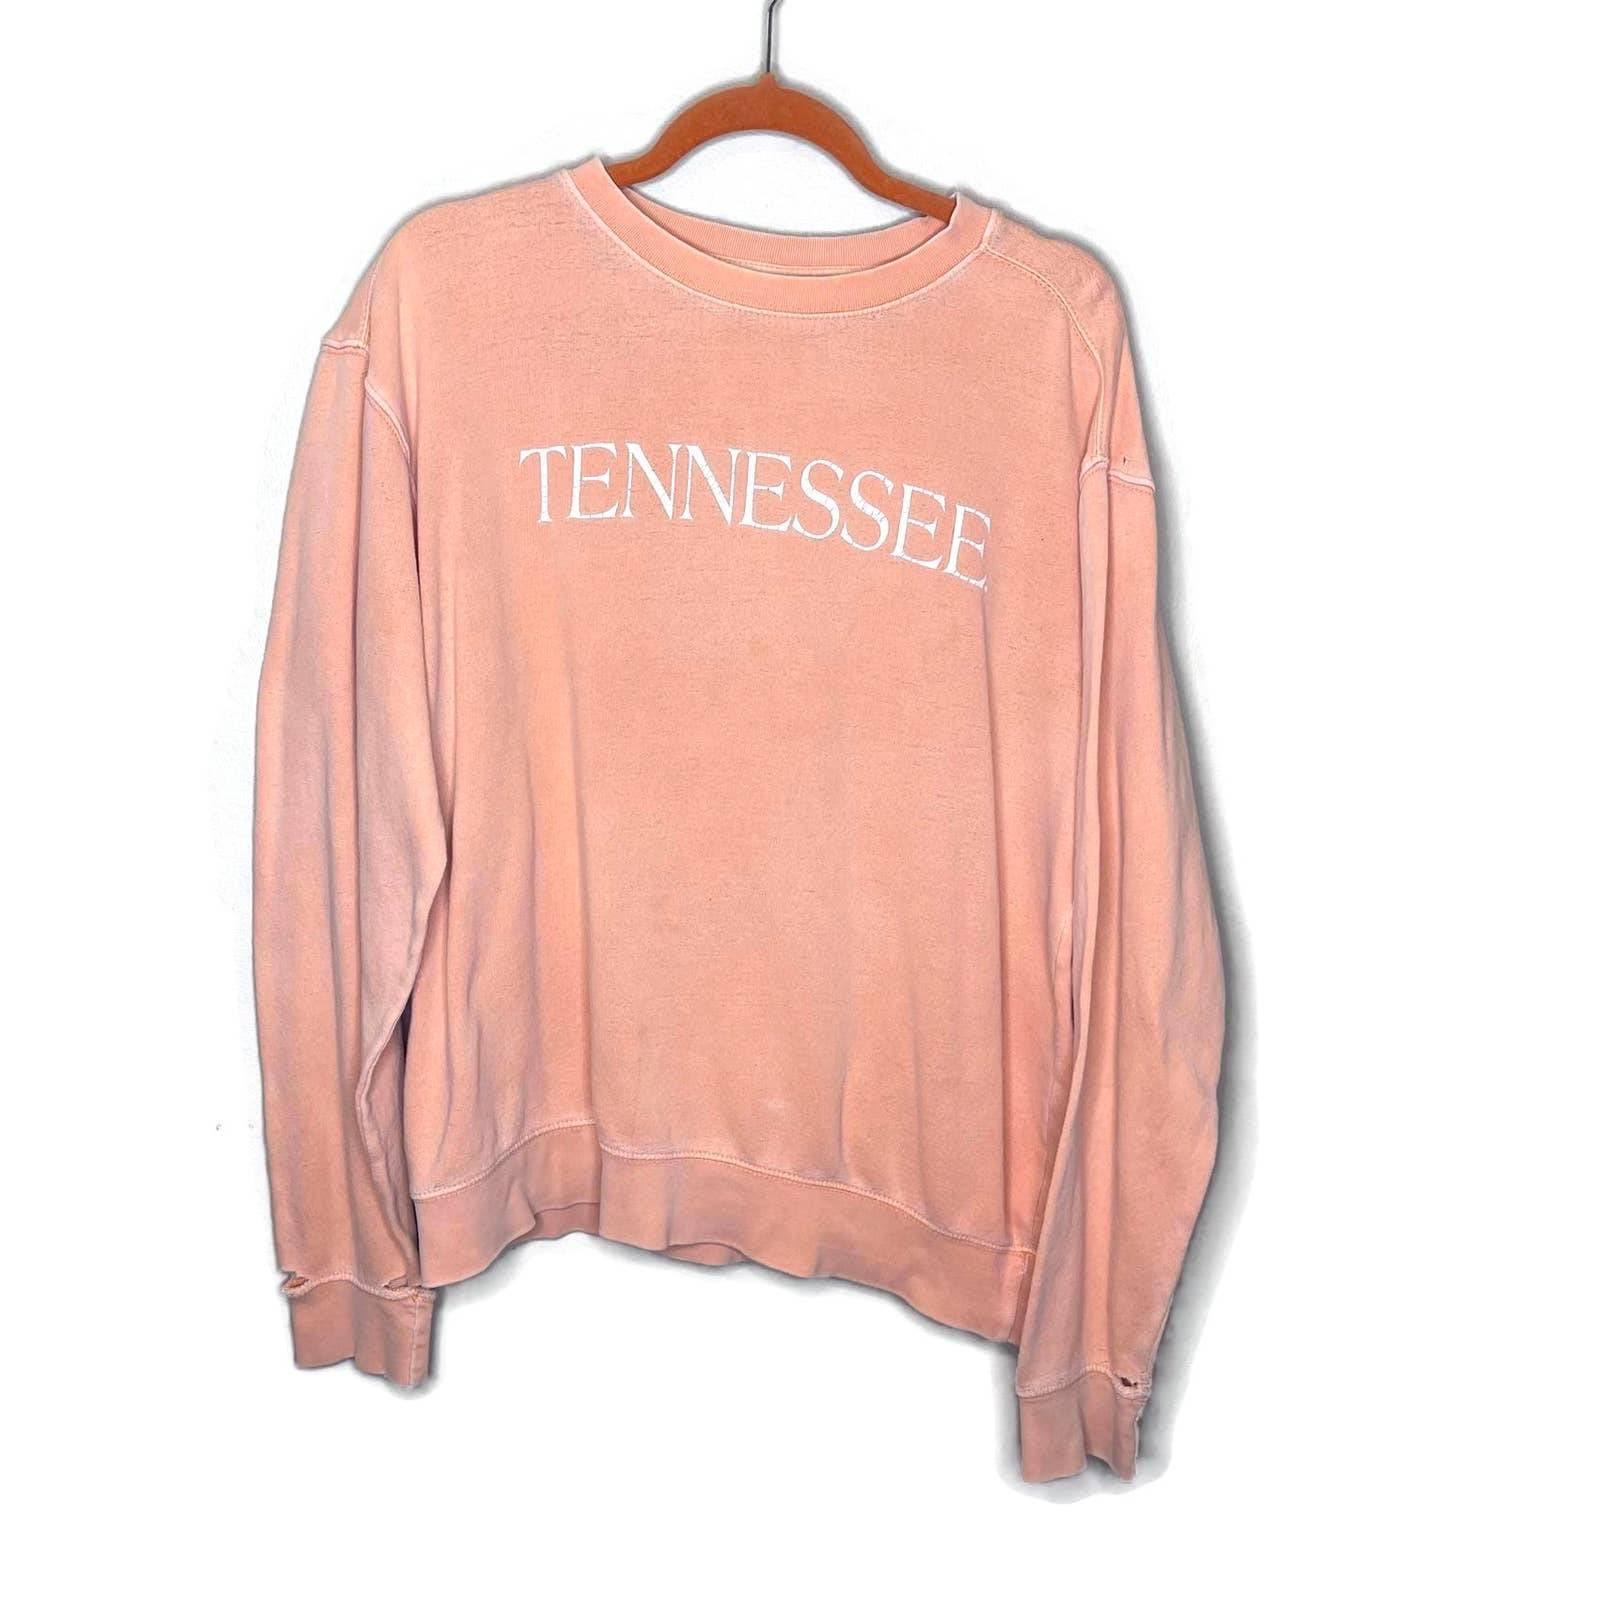 University of Tennessee women's fleece S